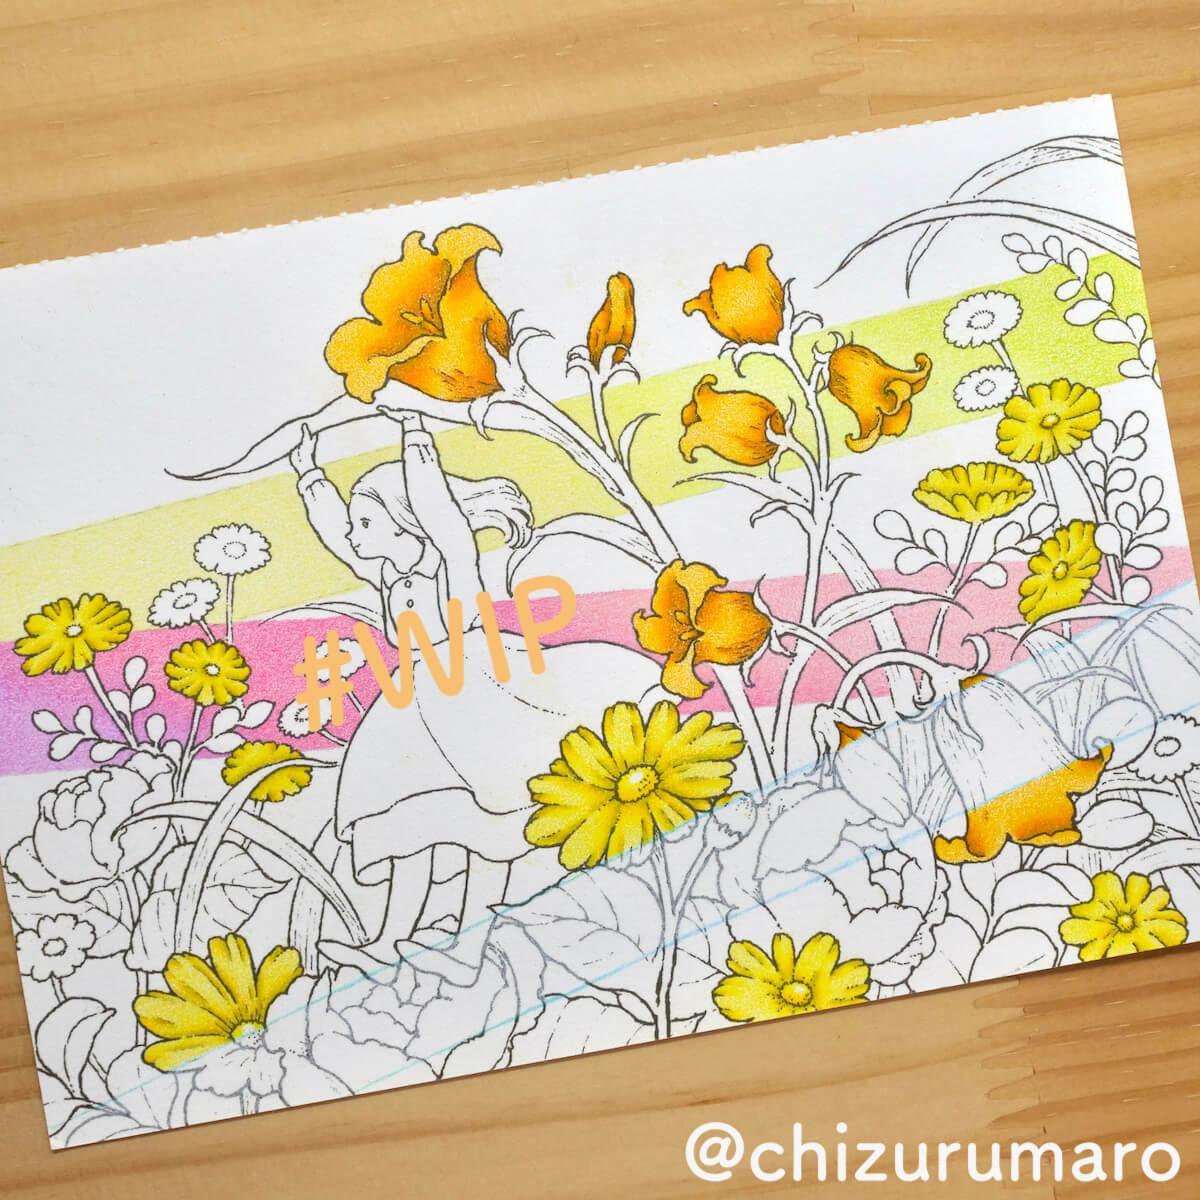 f:id:chizurumaro:20211009155739j:plain